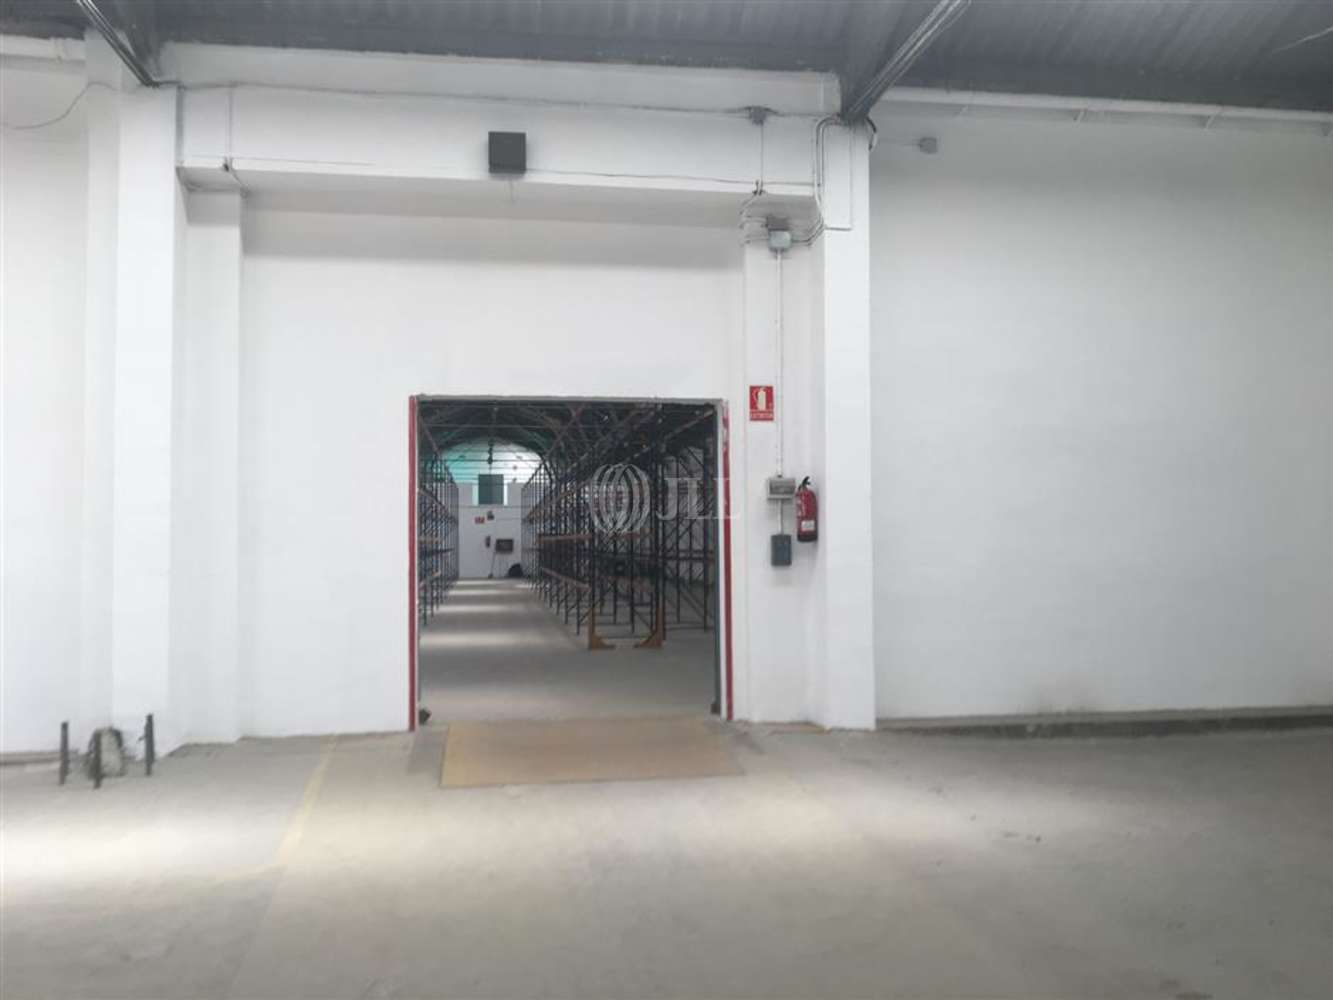 Naves industriales y logísticas Sant boi de llobregat, 08830 - Nave Industrial - B0412 - PI FONOLLAR NORD - 8269